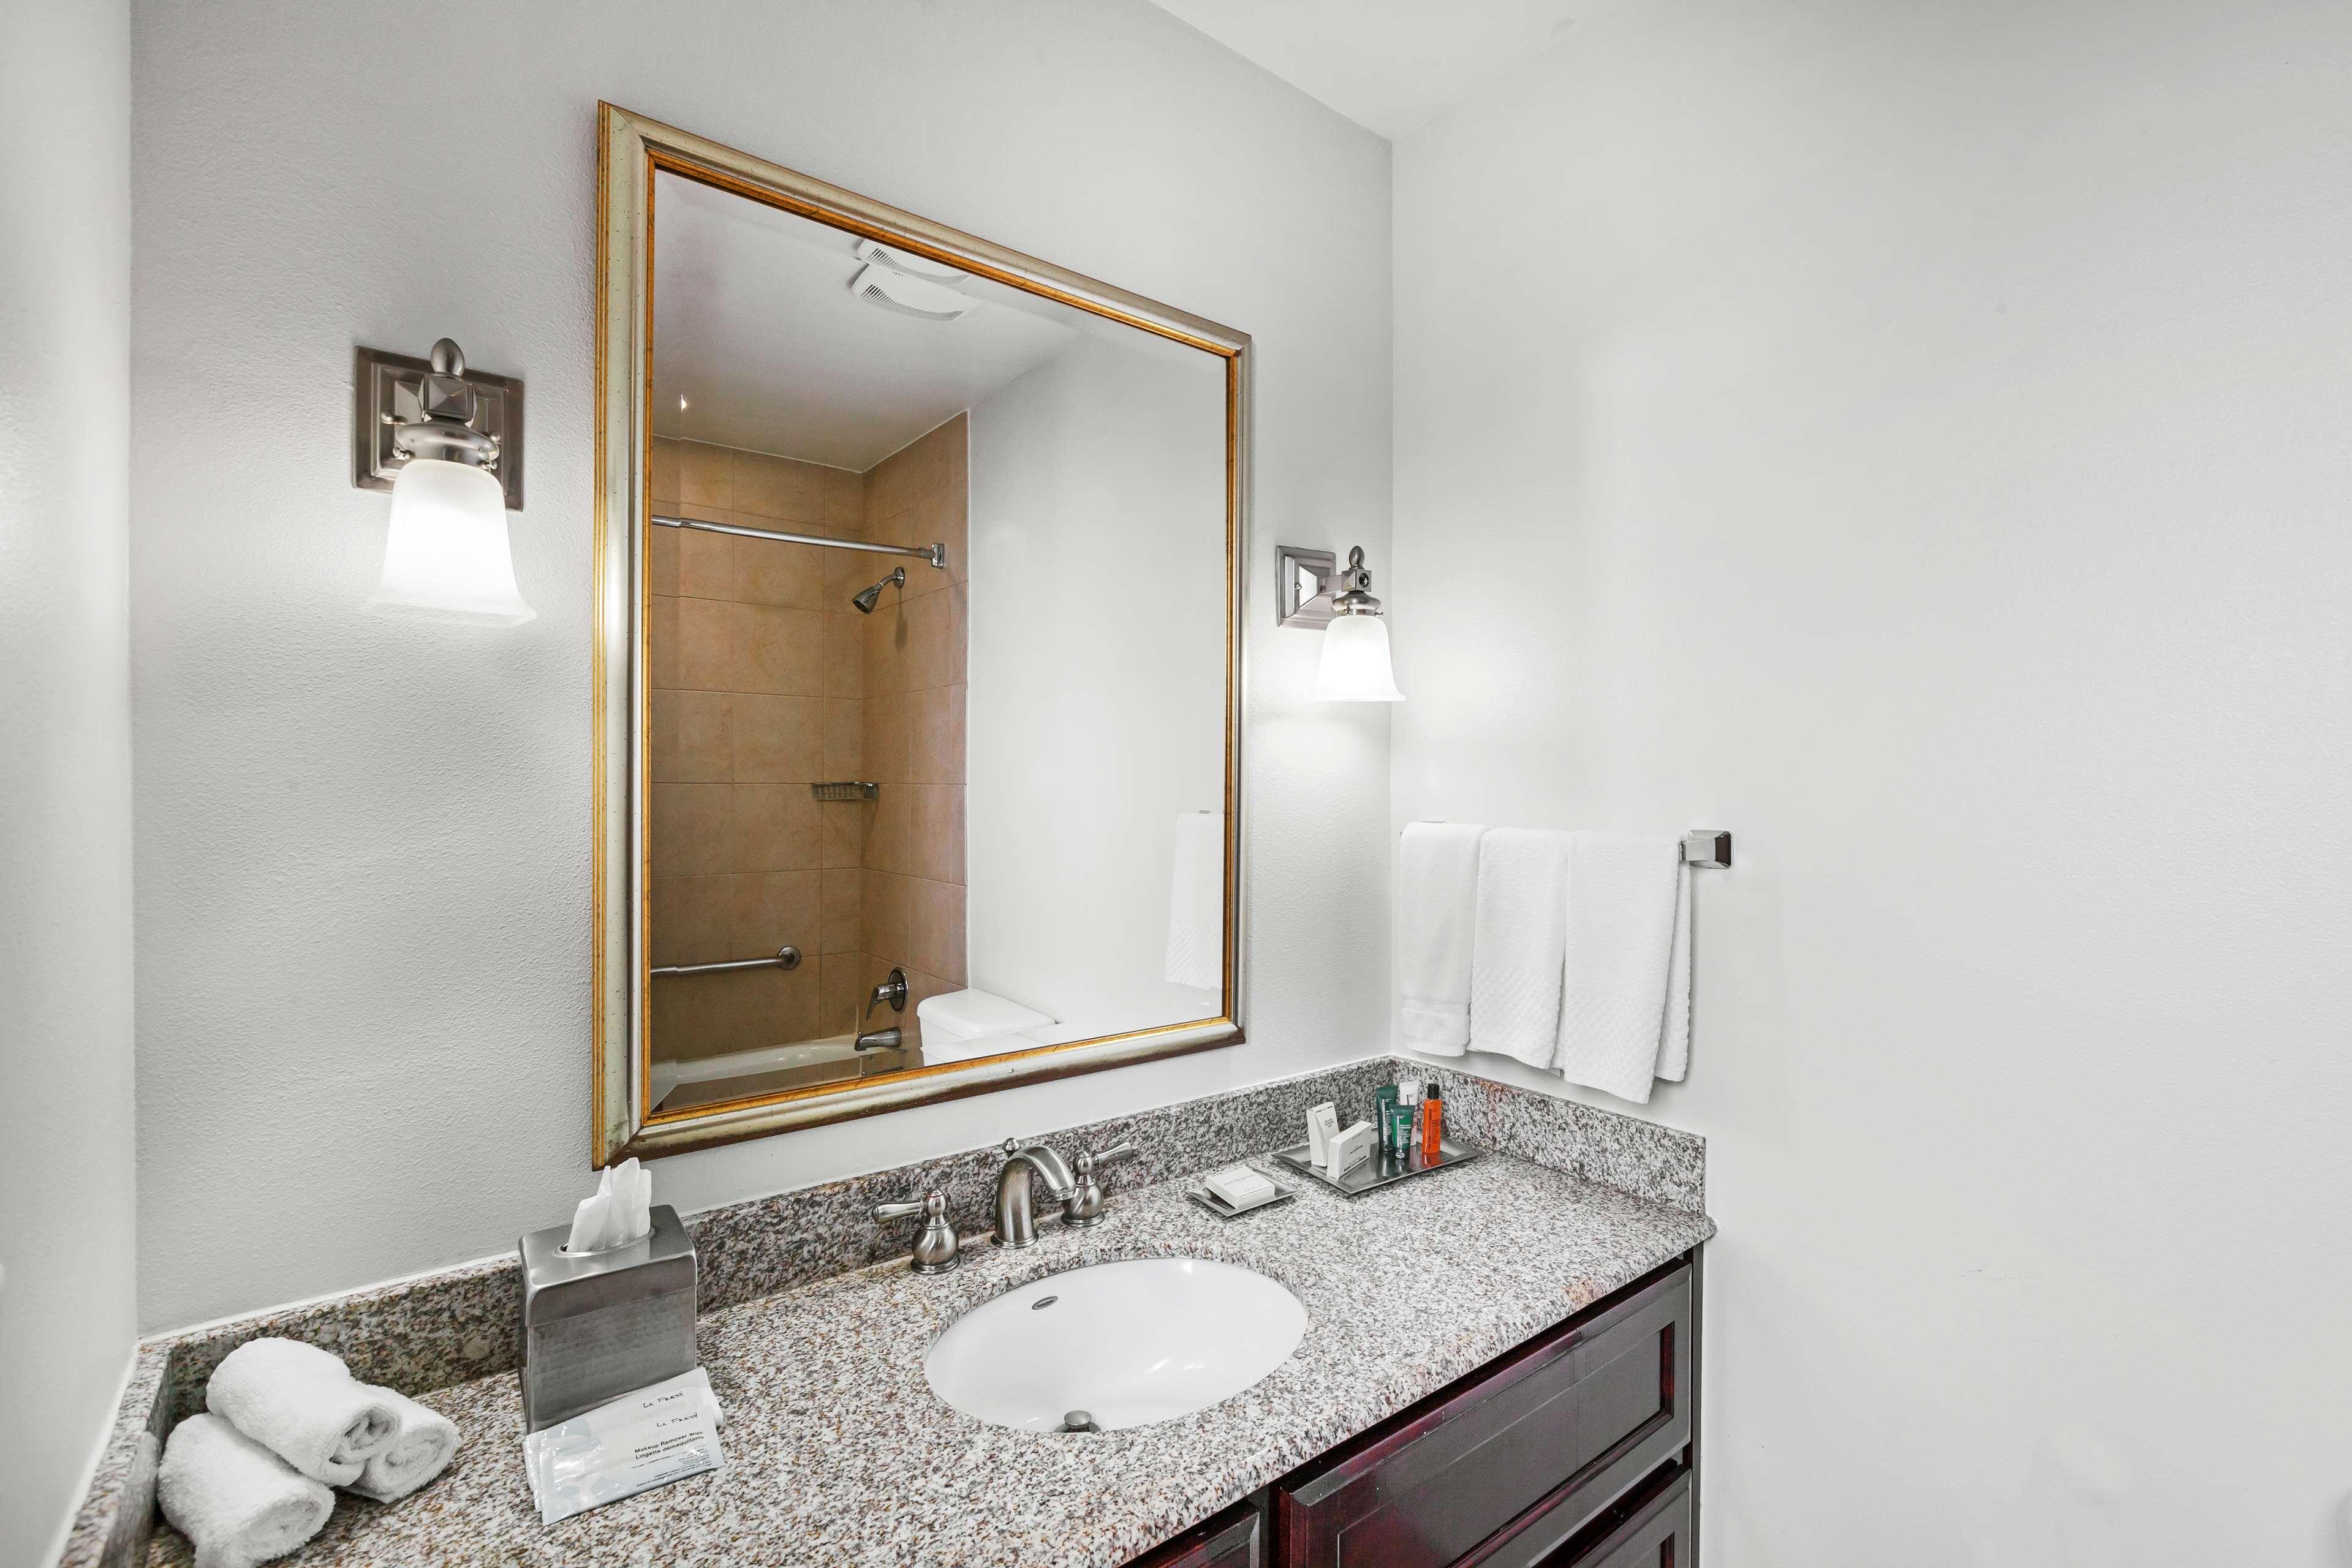 Hilton Waco image 38